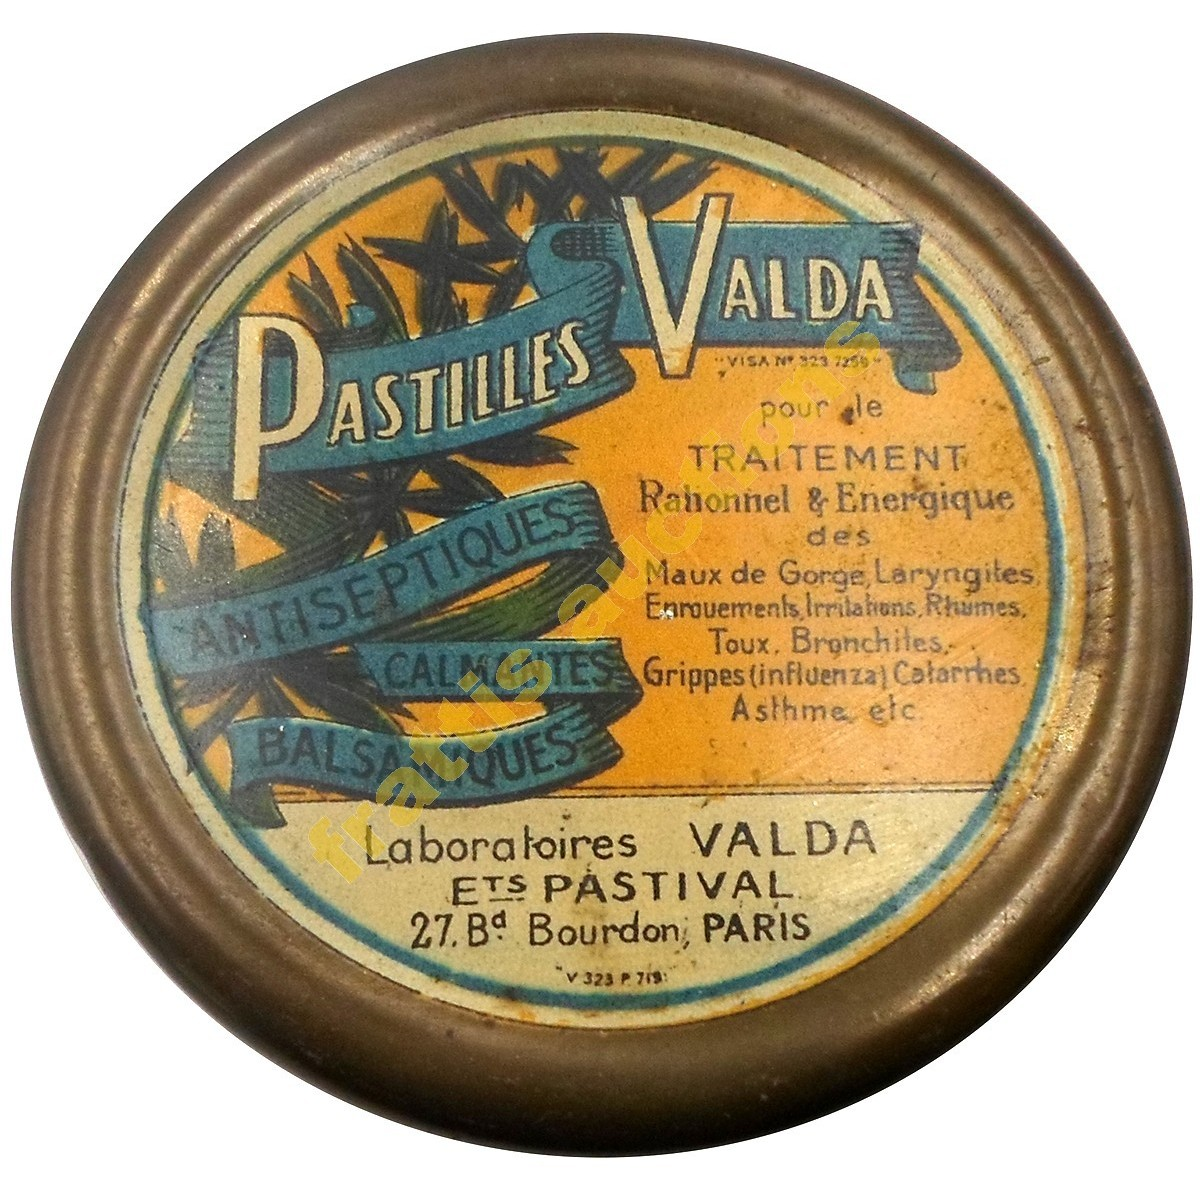 Pastilles Valda, Paris, μεταλλικό κουτί.